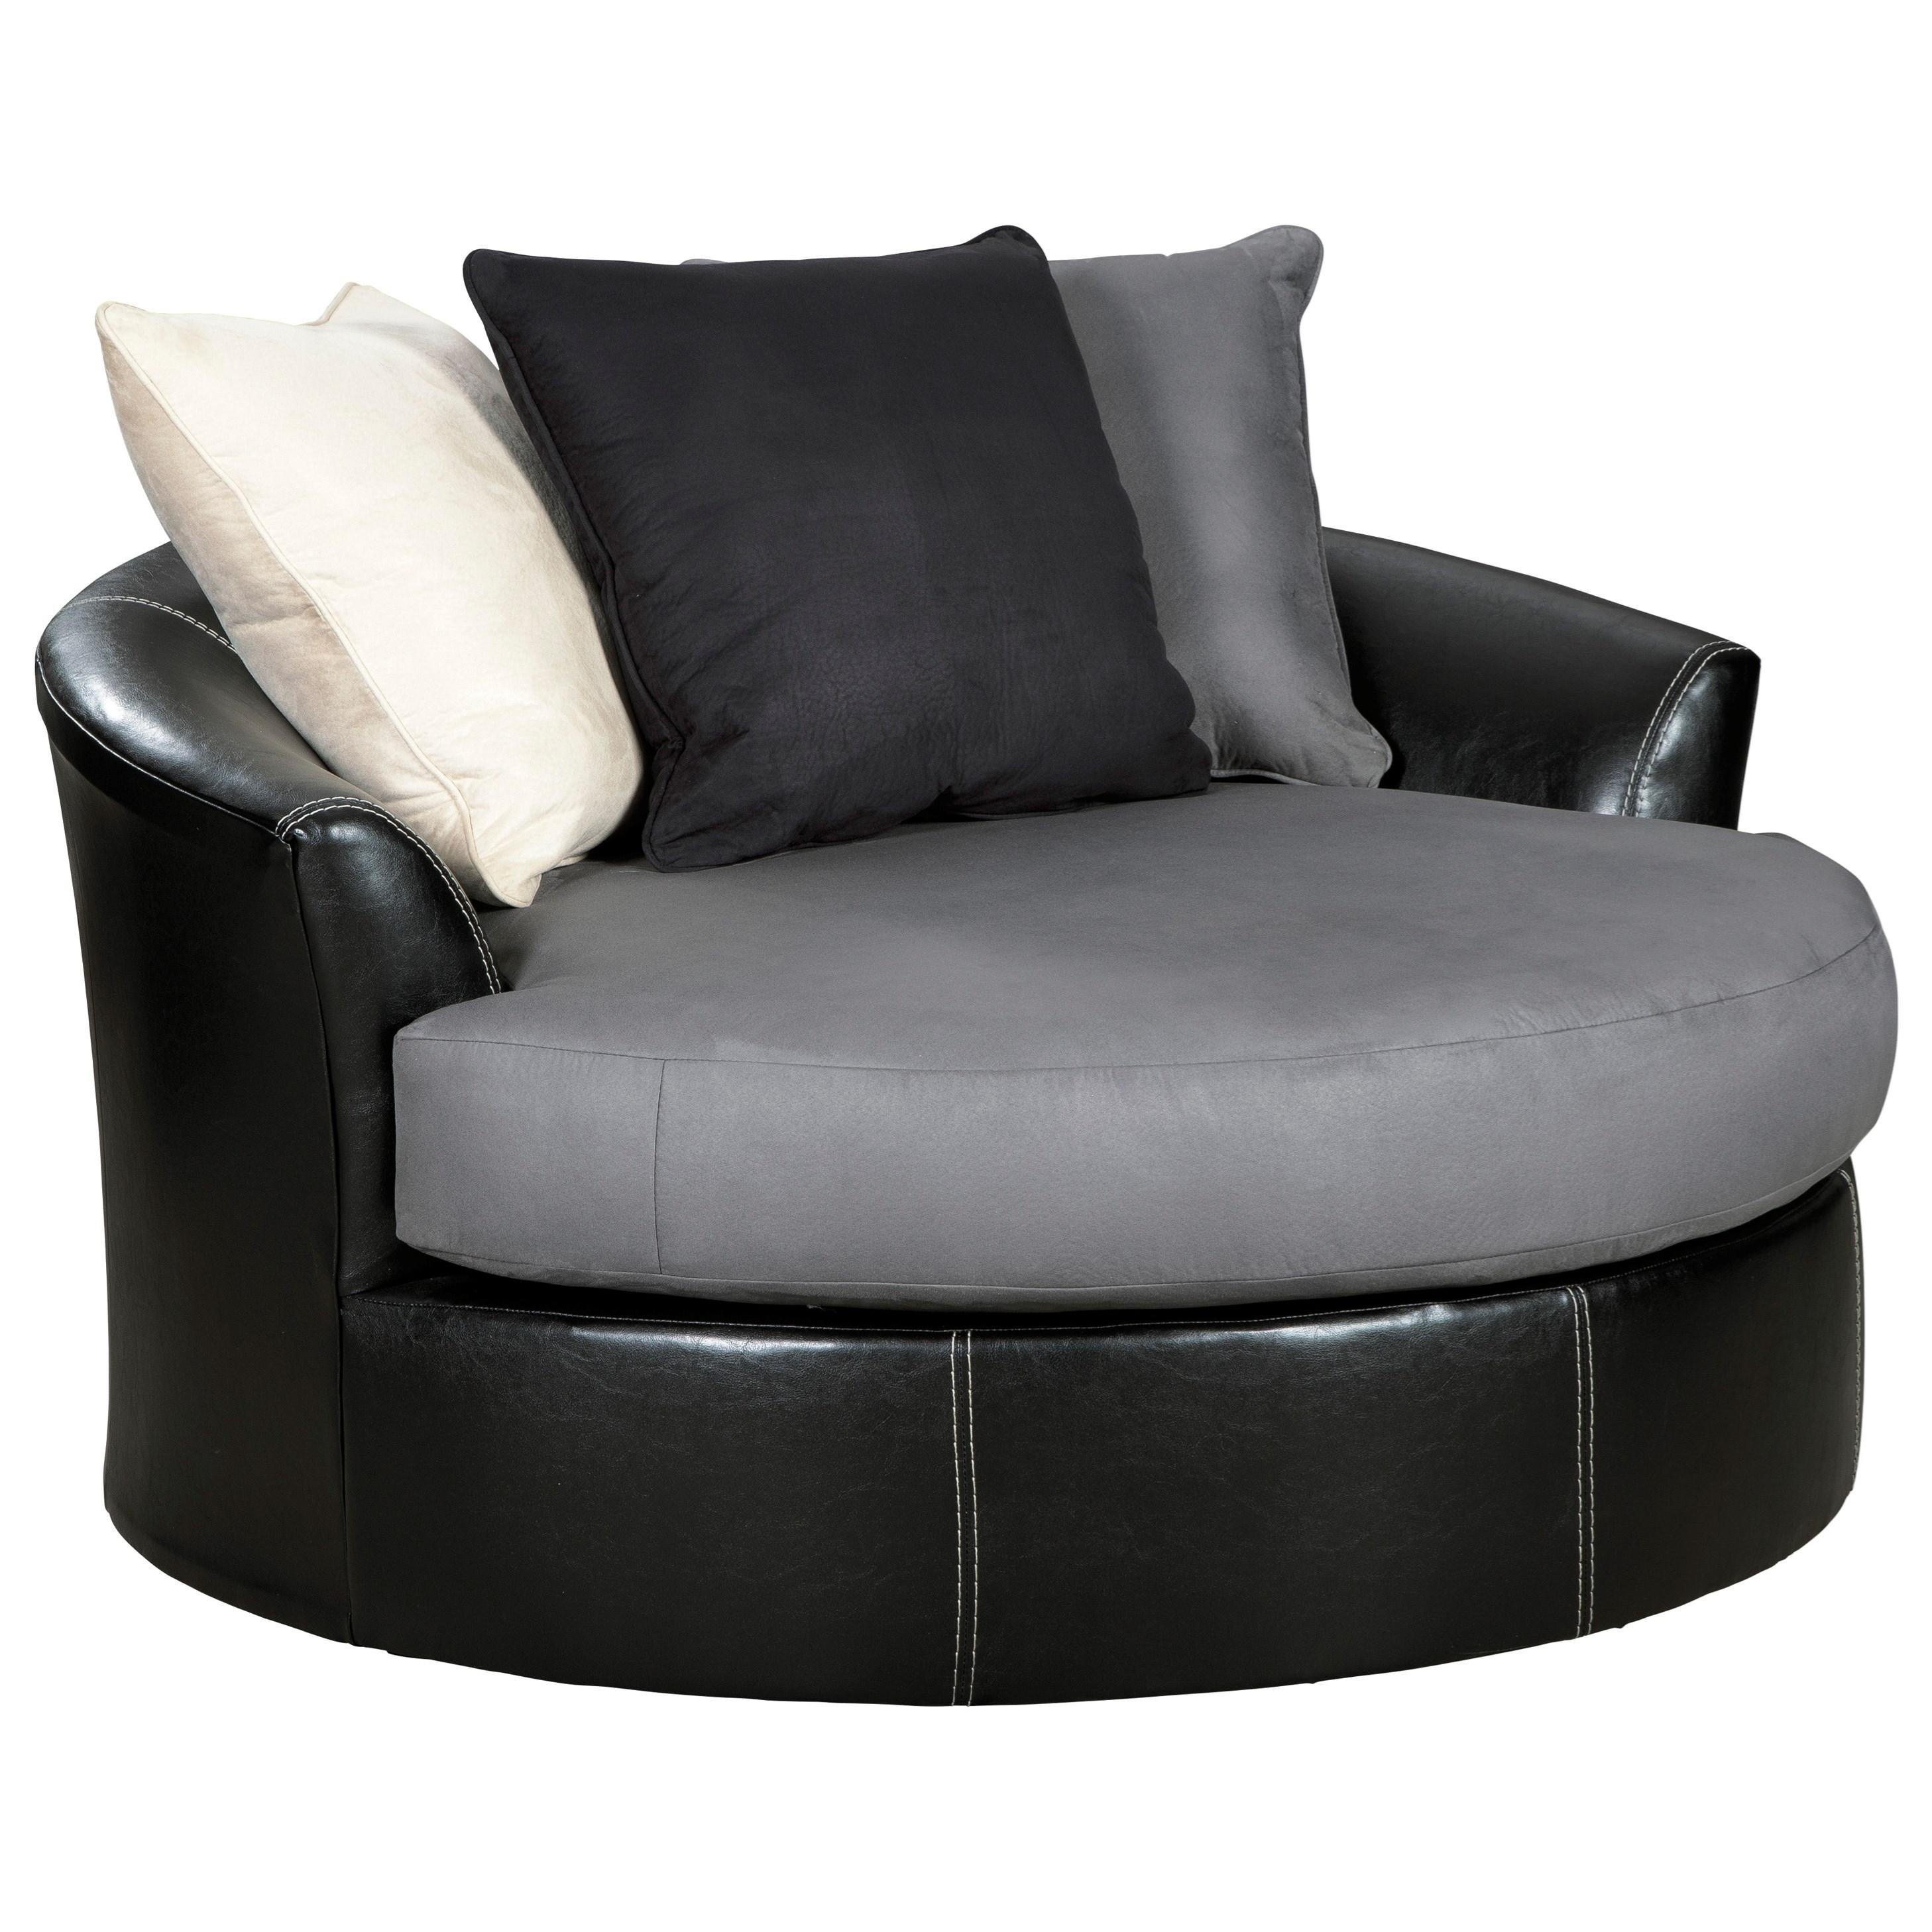 Household Furniture